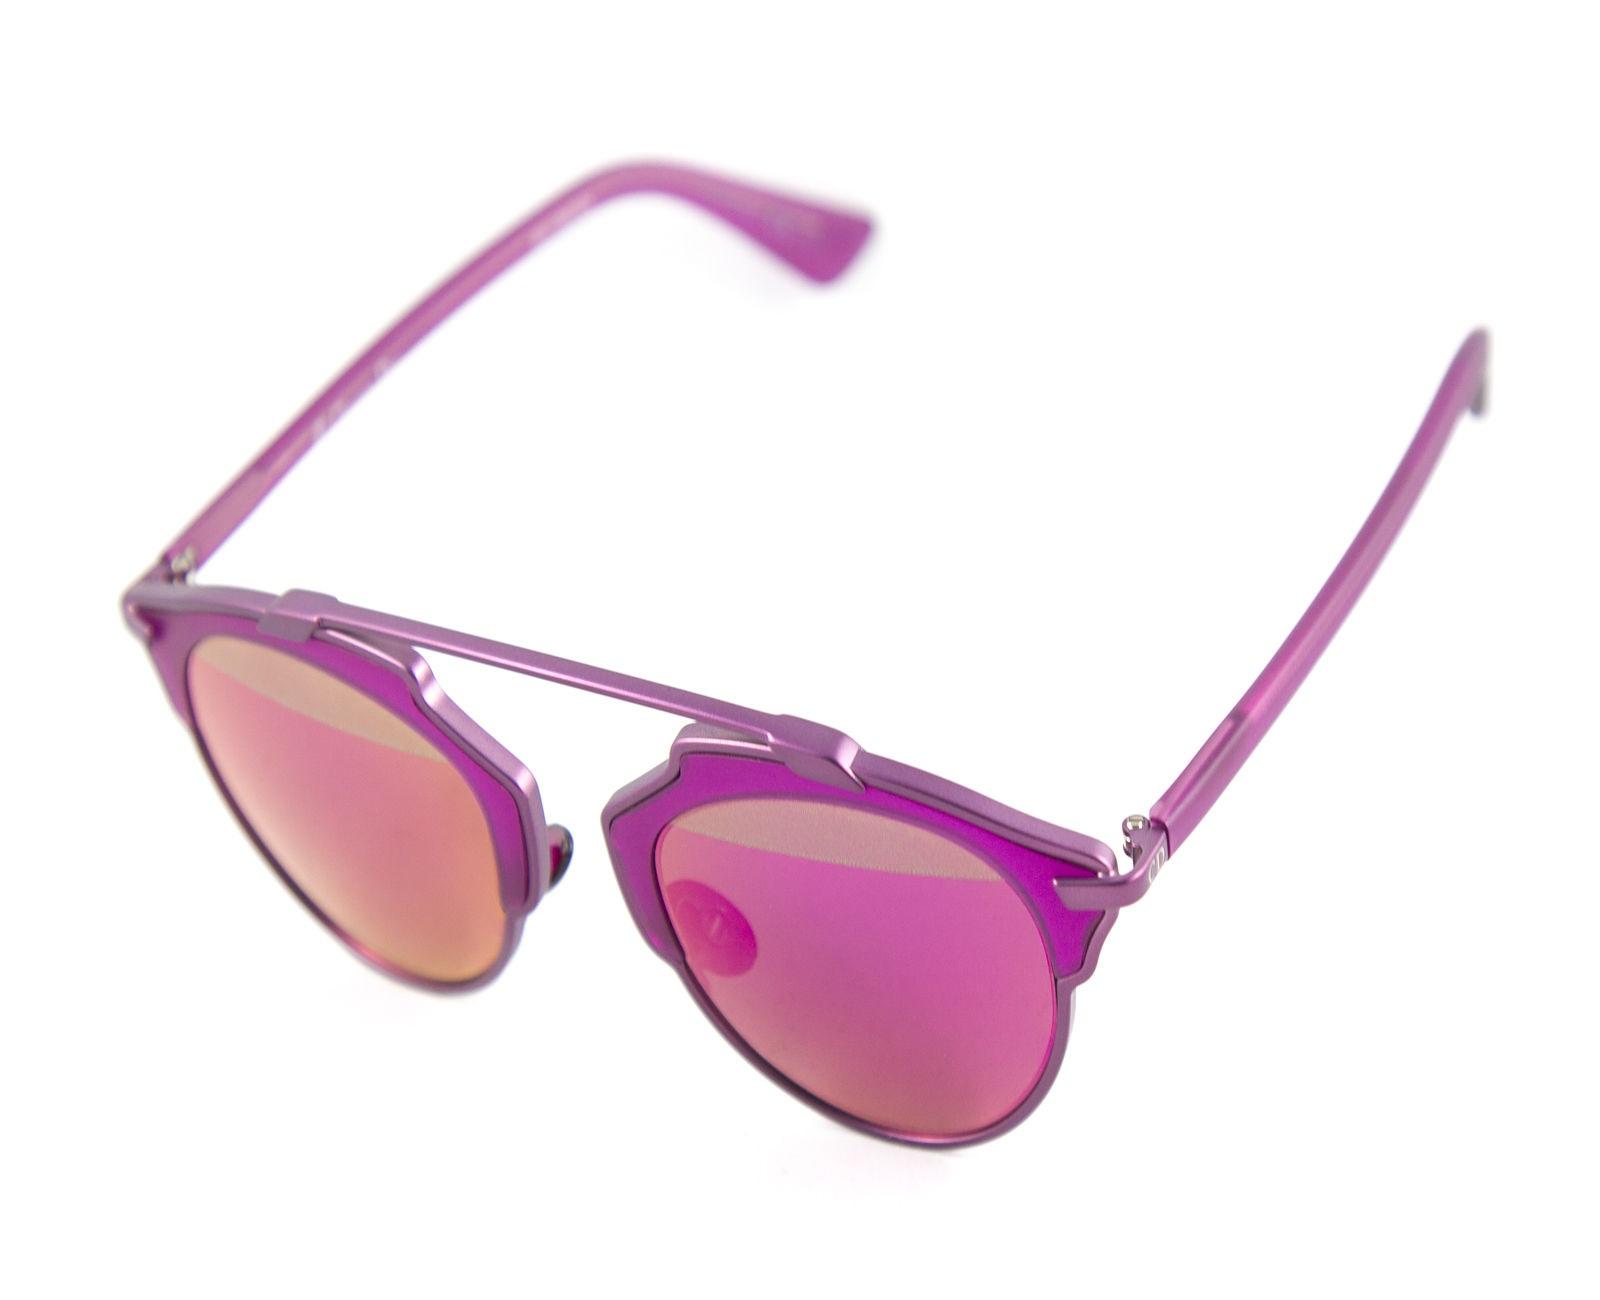 e63ac9bf5f7 Dior CHRISTIAN DIOR SO REAL sunglasses VIOLET Size one size ...